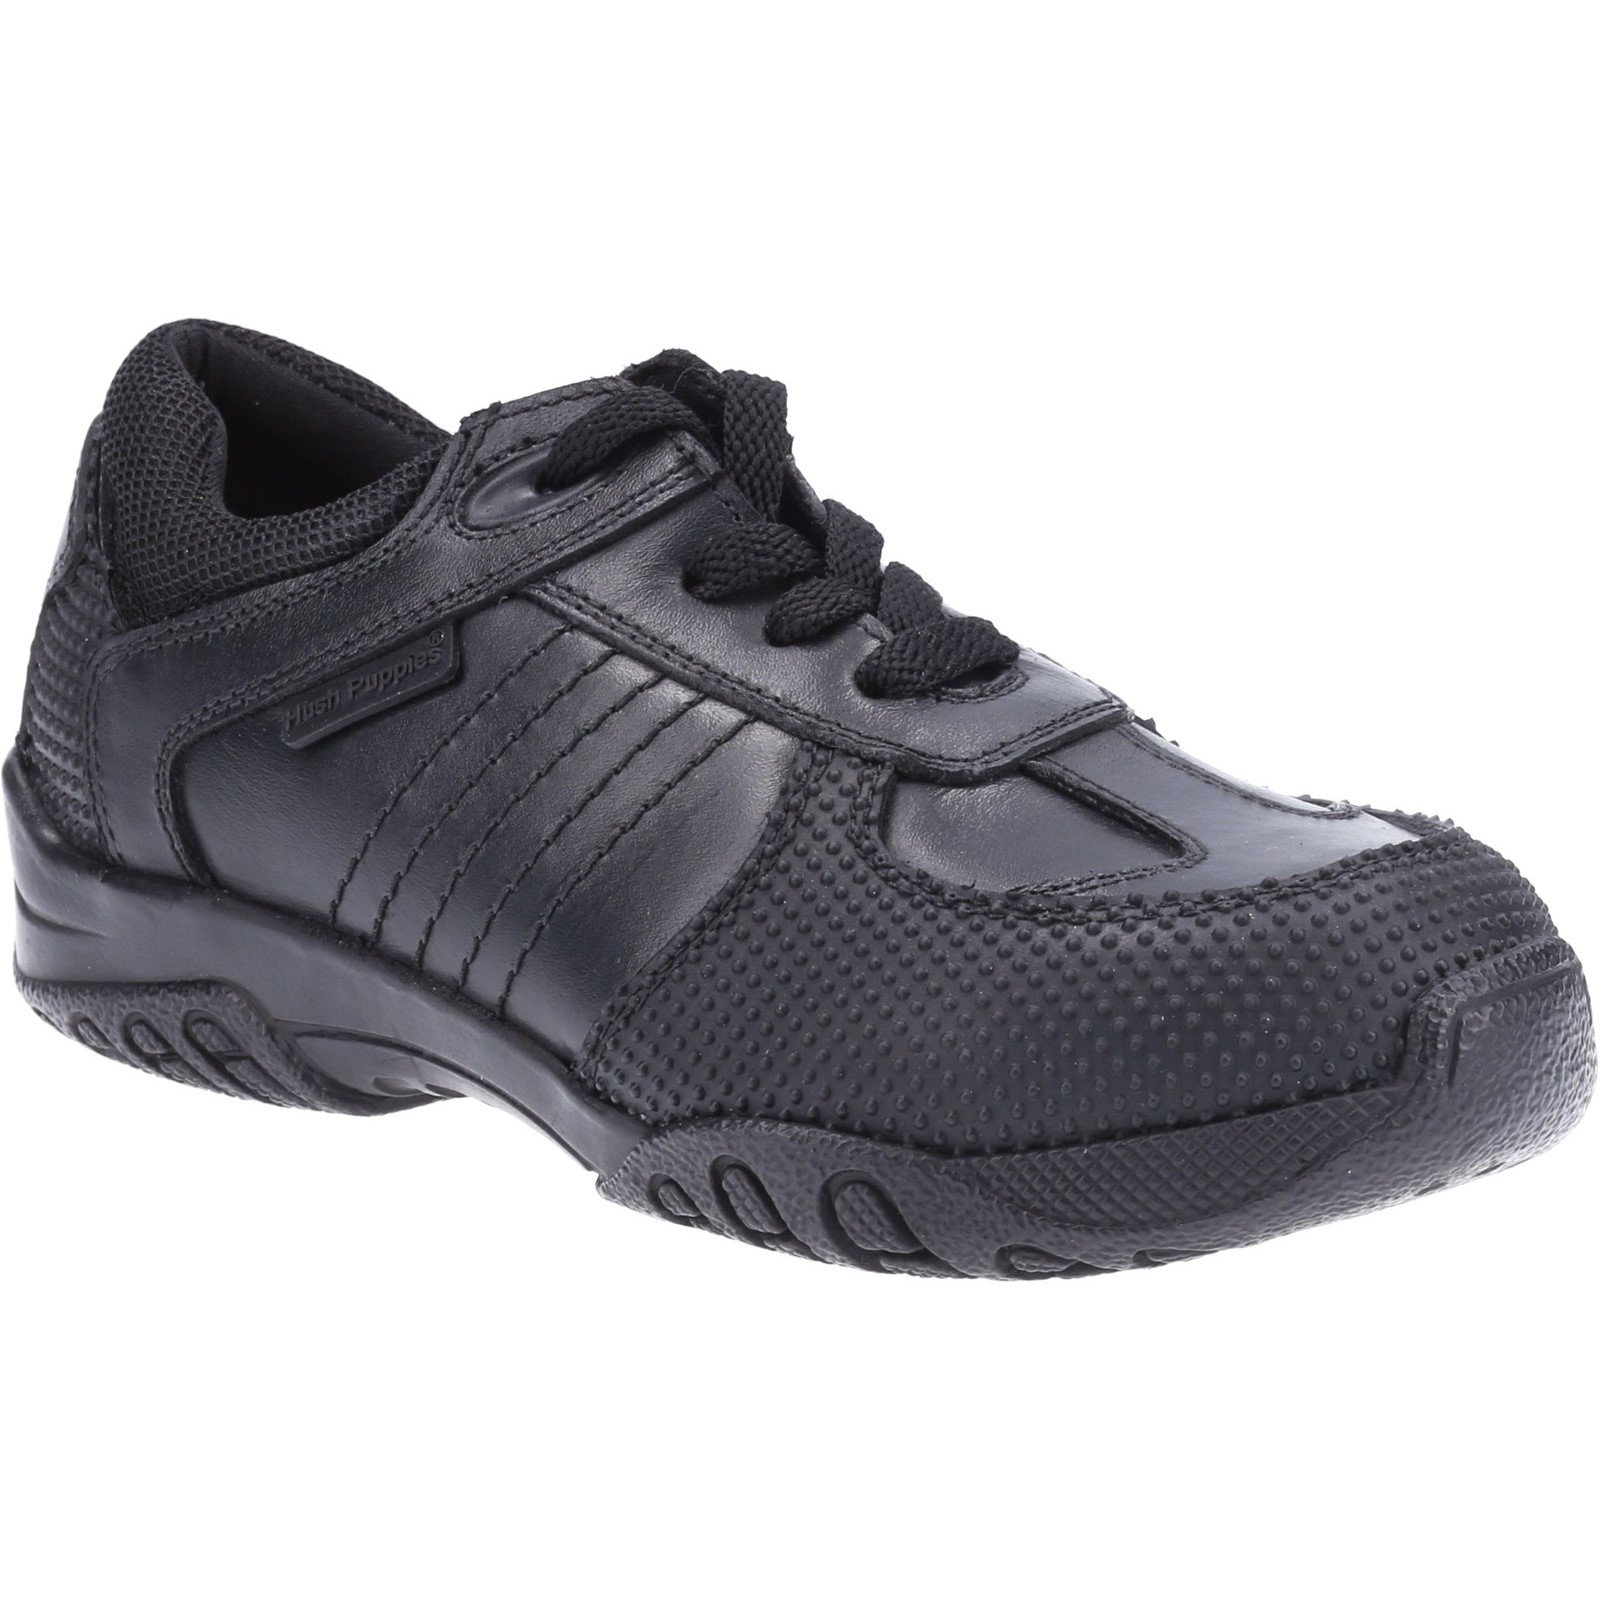 Hush Puppies Kid's Jezza Junior School Shoe Black 32587 - Black 10